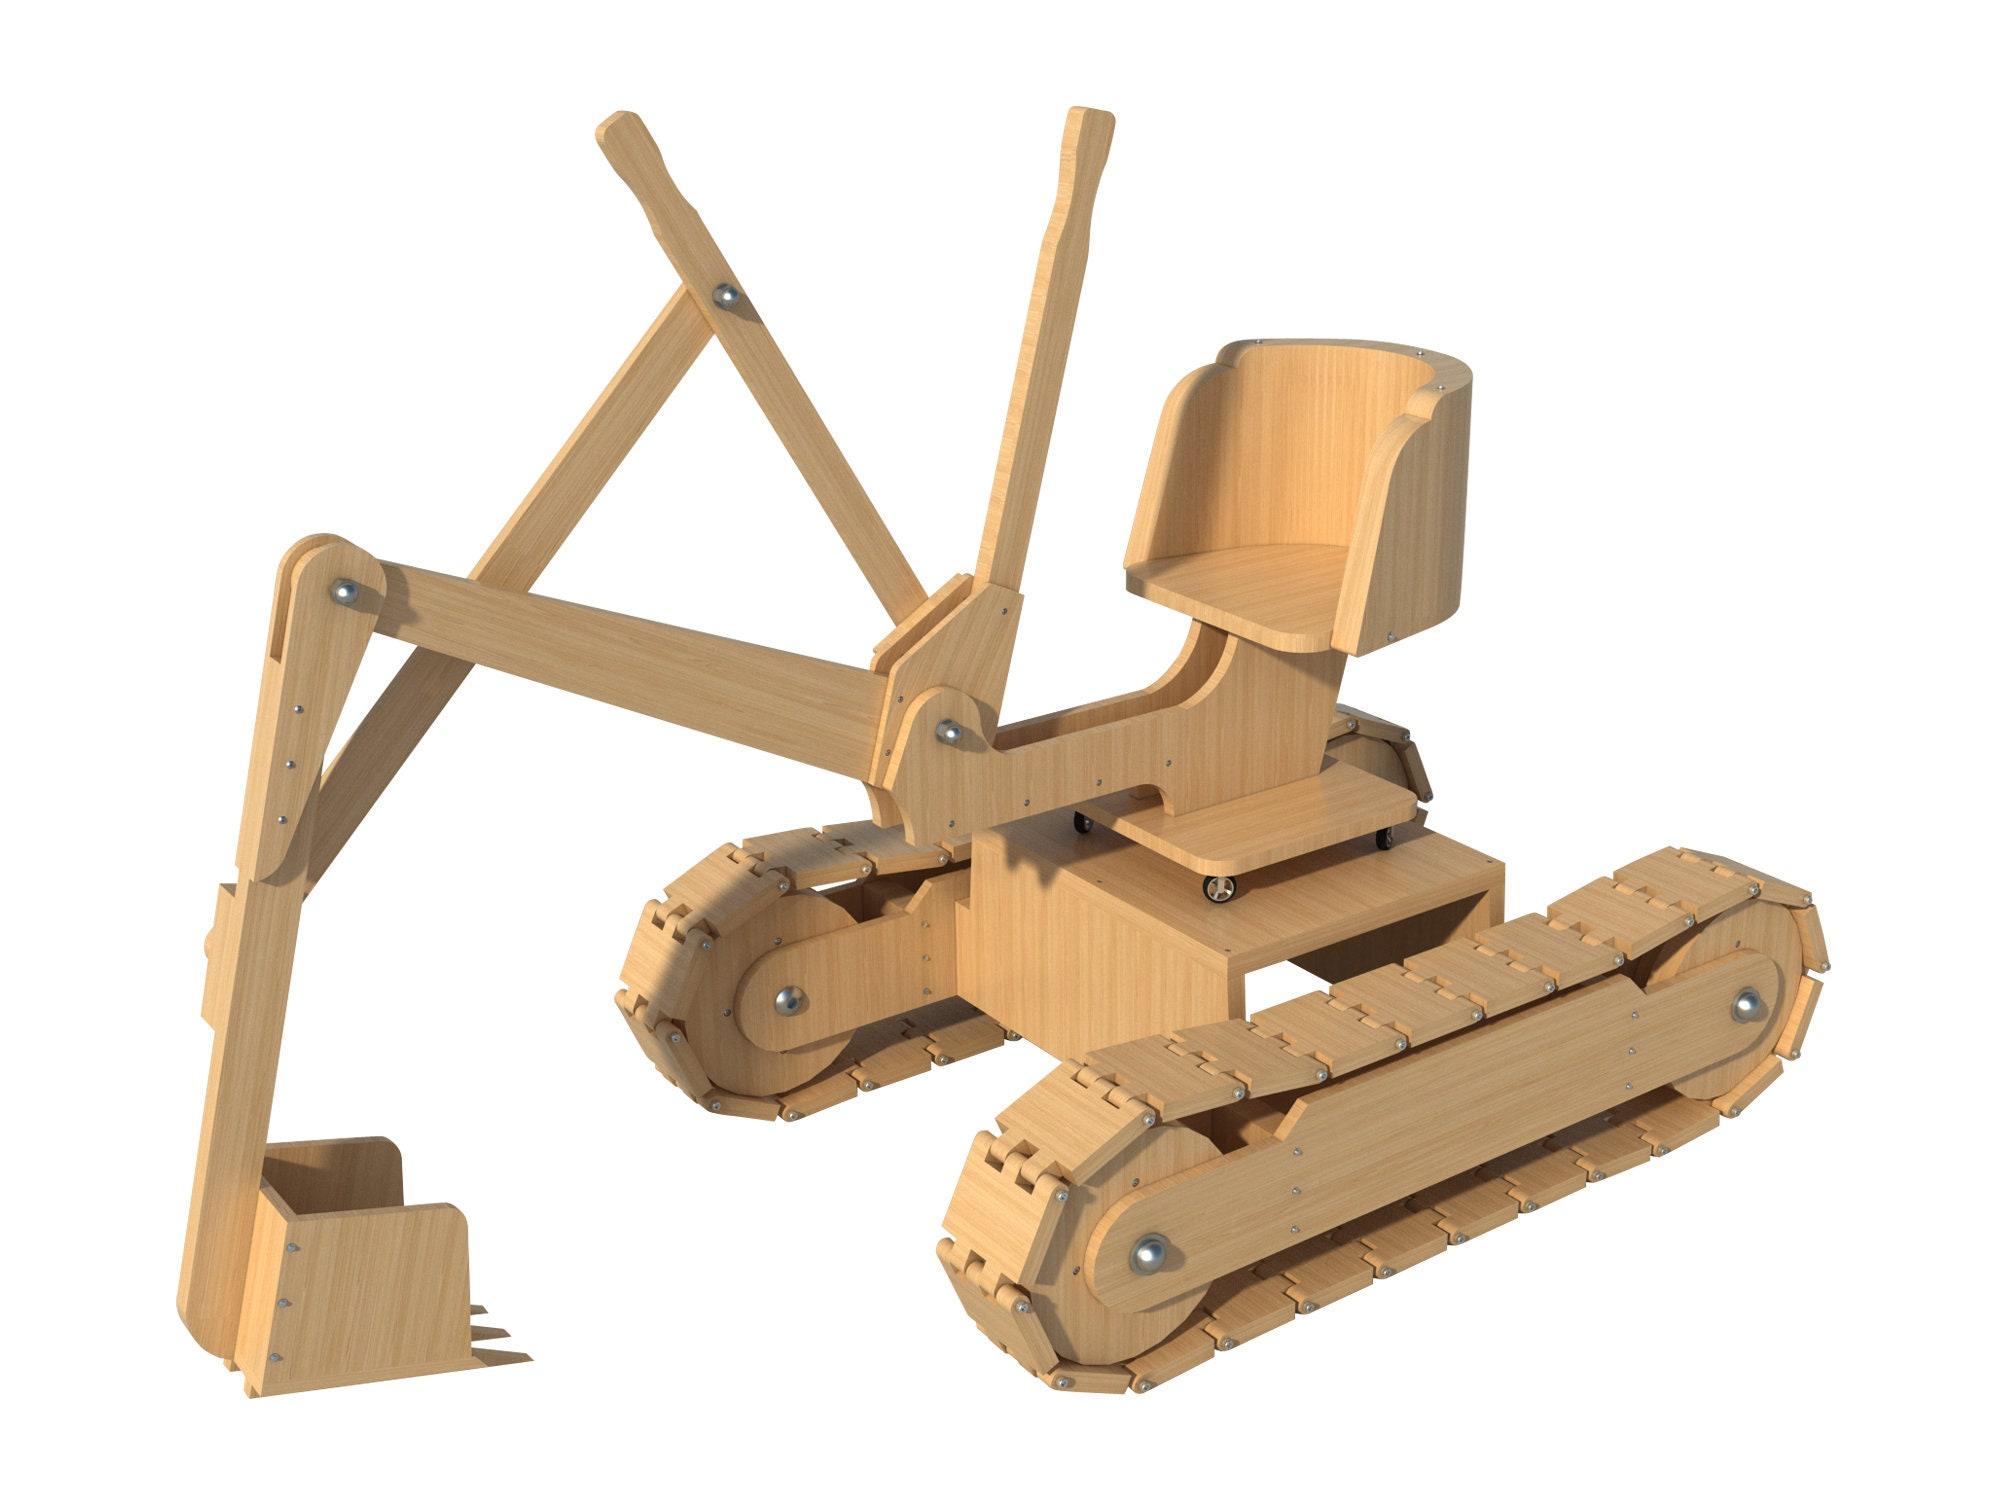 kids riding backhoe toy plans diy woodworking backyard children excavator  digger